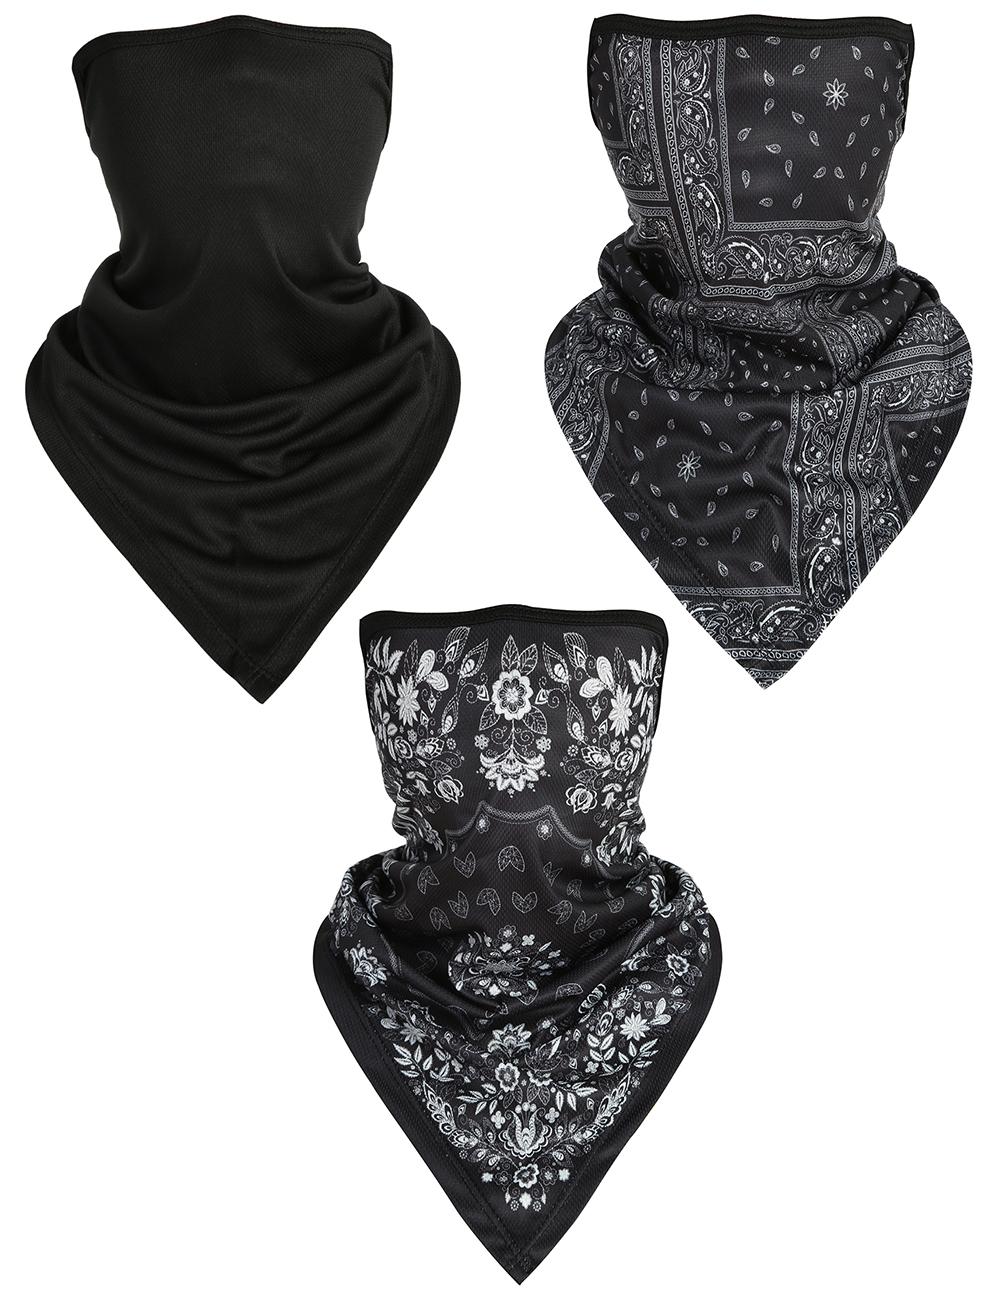 Blackout American Flag Face Sun Scarf Muffler Balaclava Outdoor Scarf Headwear